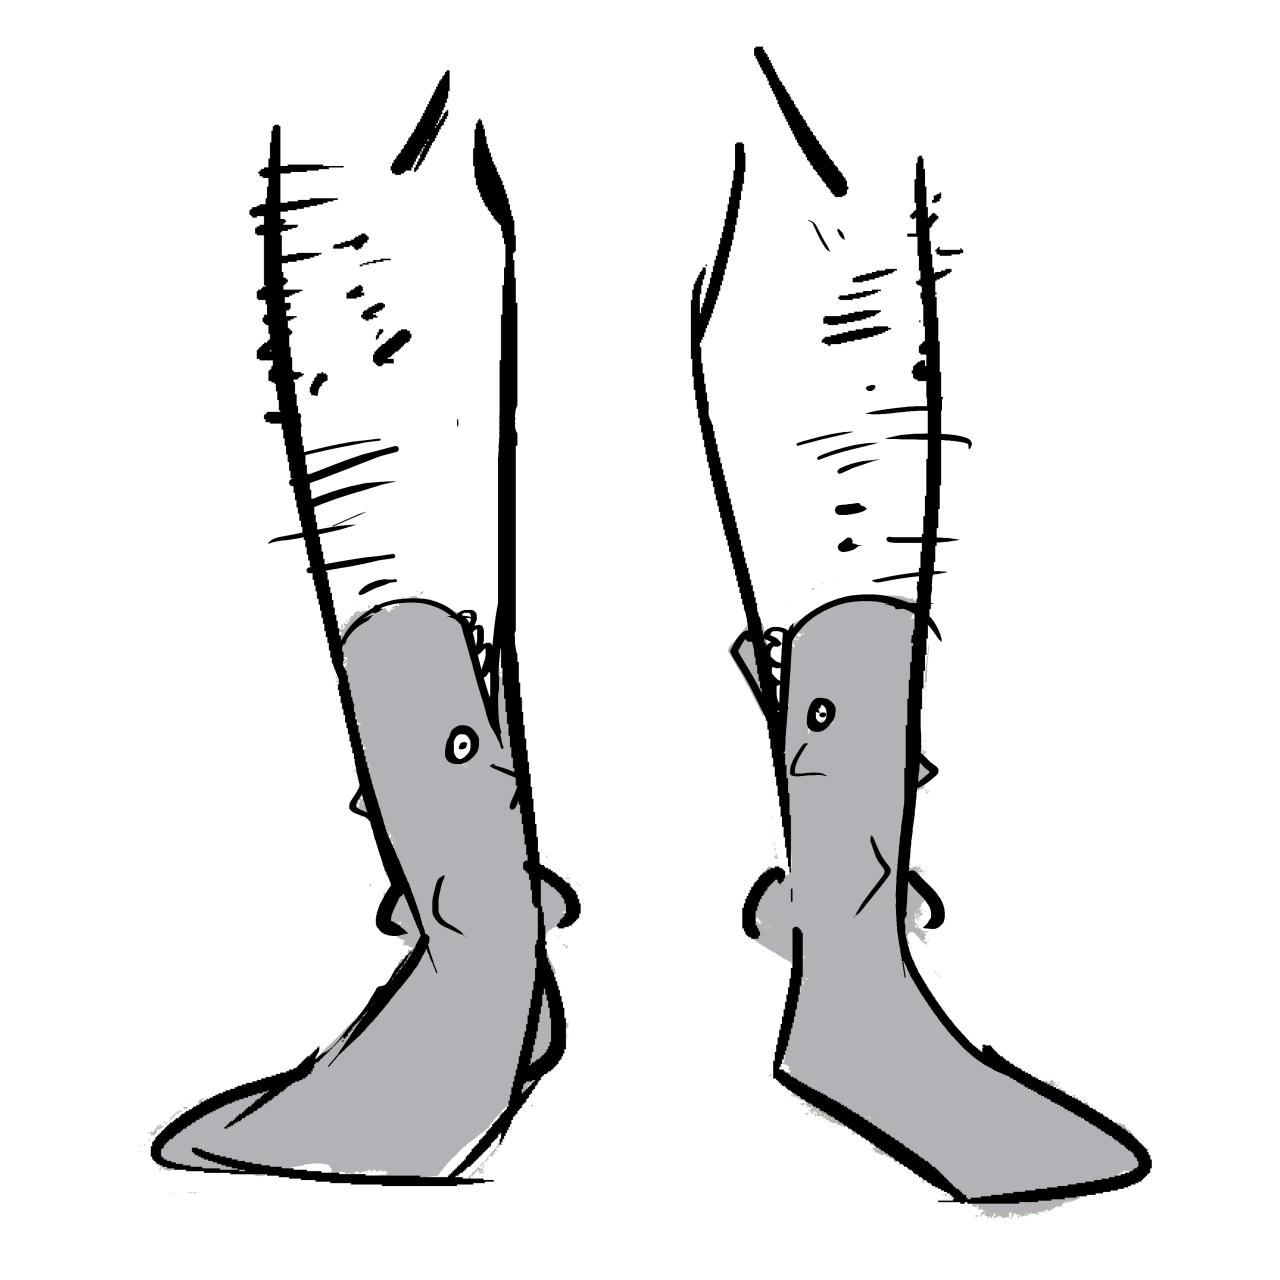 Grey socks made to look like sharks. The tops look like mouths.